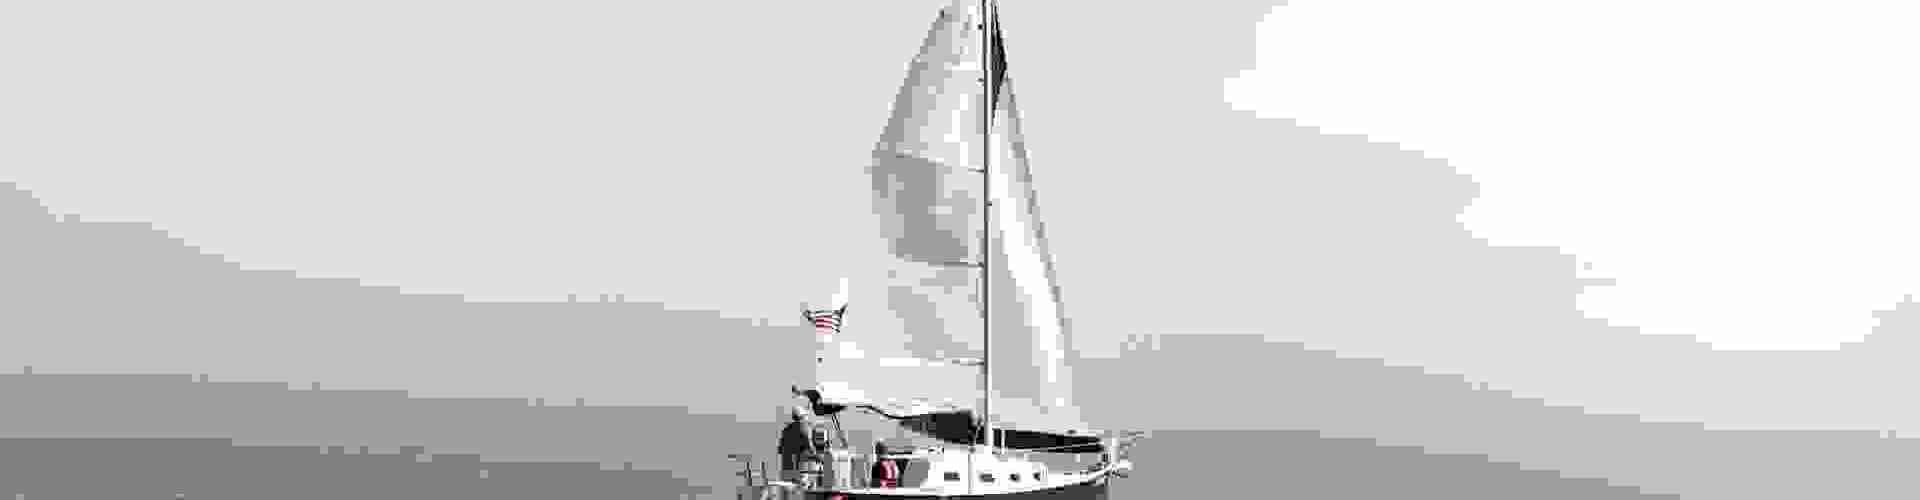 Yacht Race '15